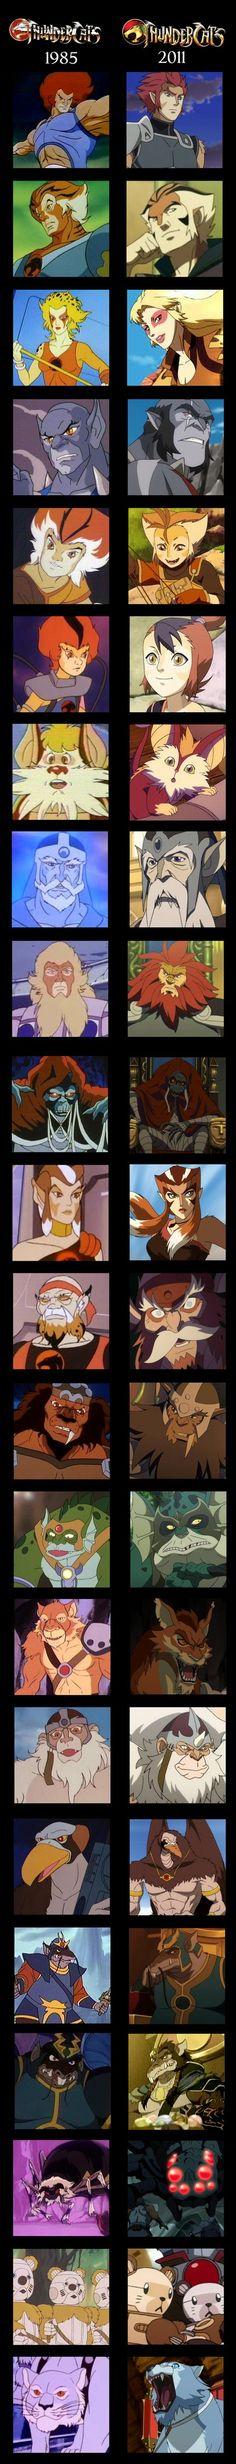 Thundercats 1985 and 2011 Comparison by Ilona-the-Sinister.deviantart.com on @deviantART #1980s #cartoons